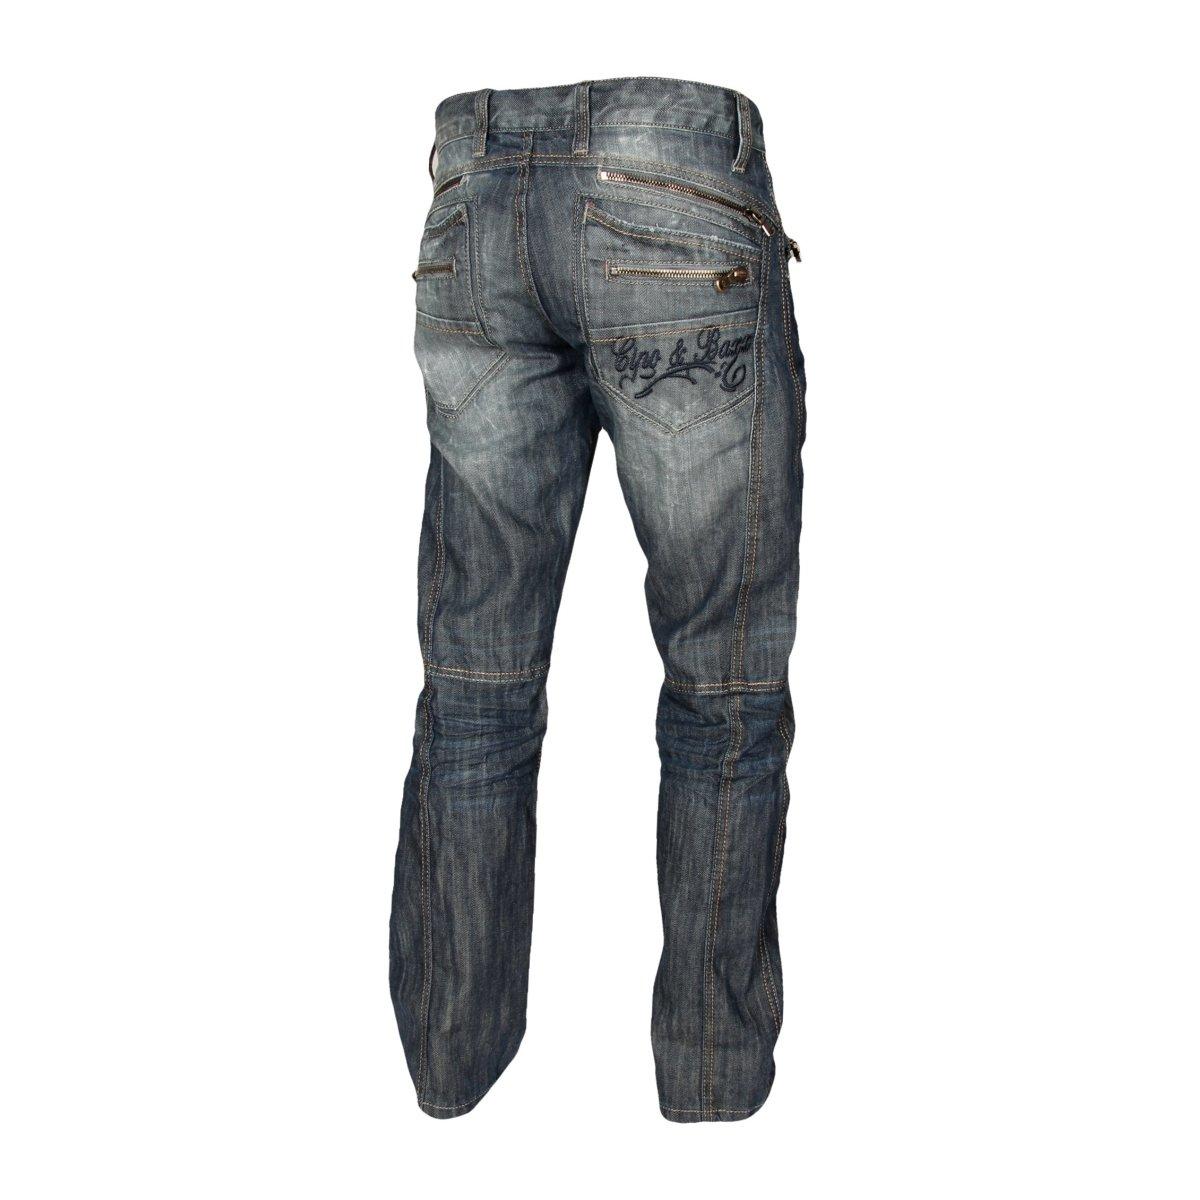 a71d27bcc88b6e Cipo   Baxx Herren Straight Leg Jeans C-0751  Amazon.de  Bekleidung